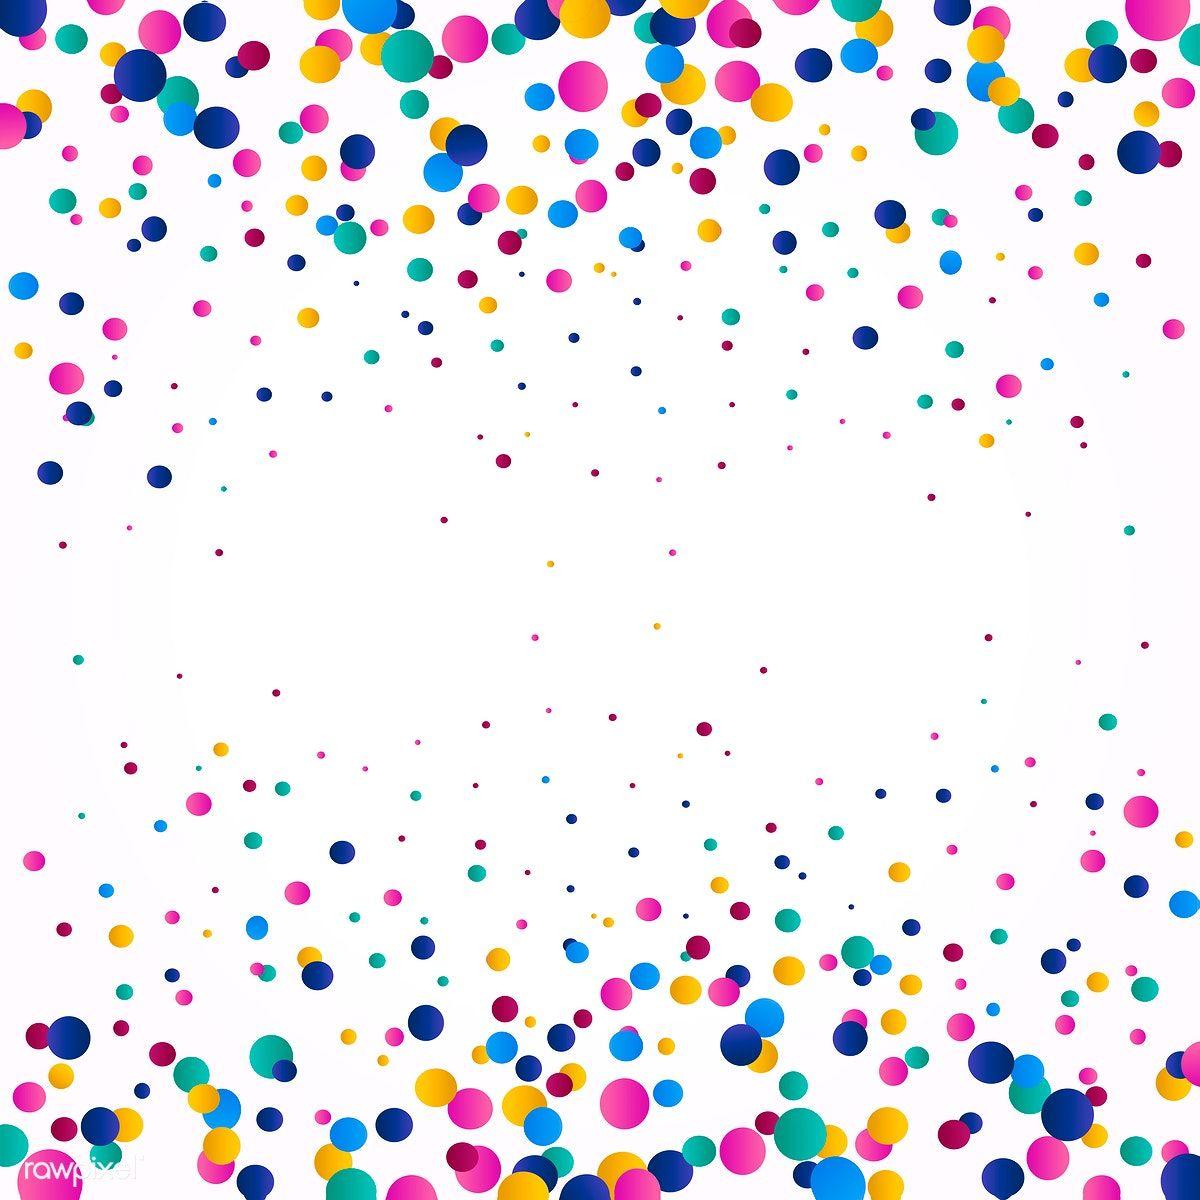 Colorful Confetti Background Explosion Vector Free Image By Rawpixel Com Filmful Confetti Background Balloon Background Birthday Background Design